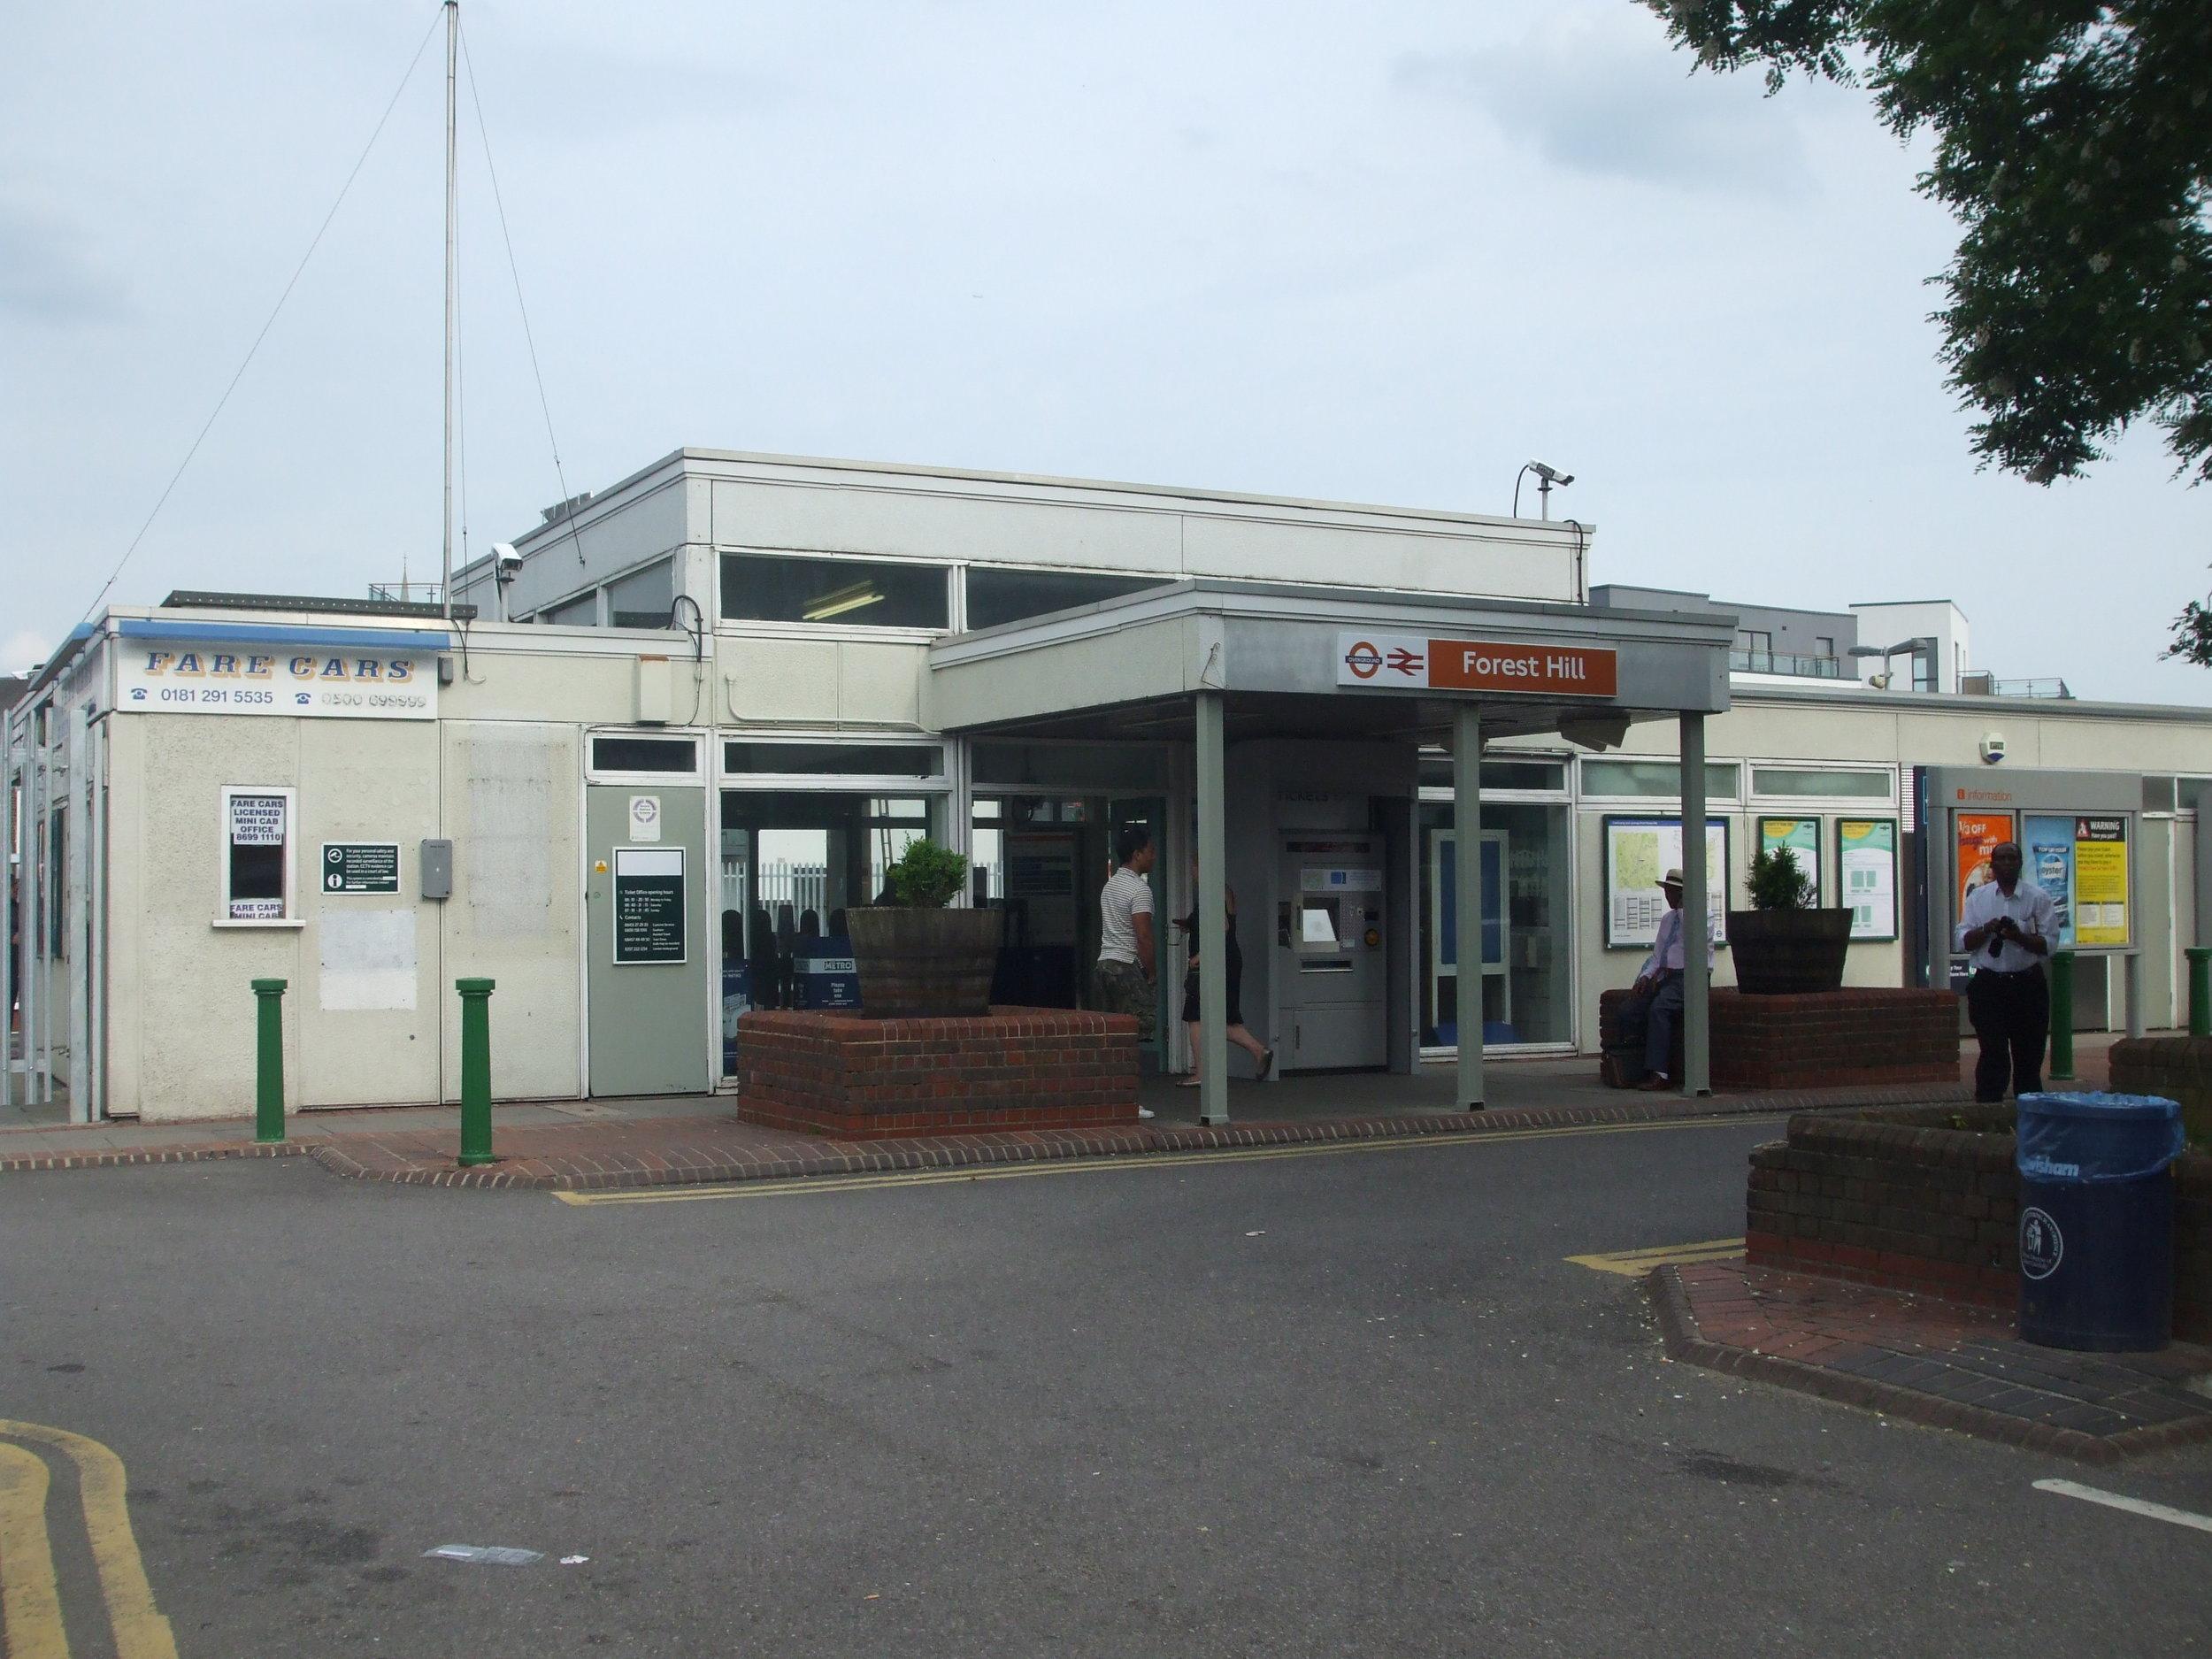 forest hill station.JPG